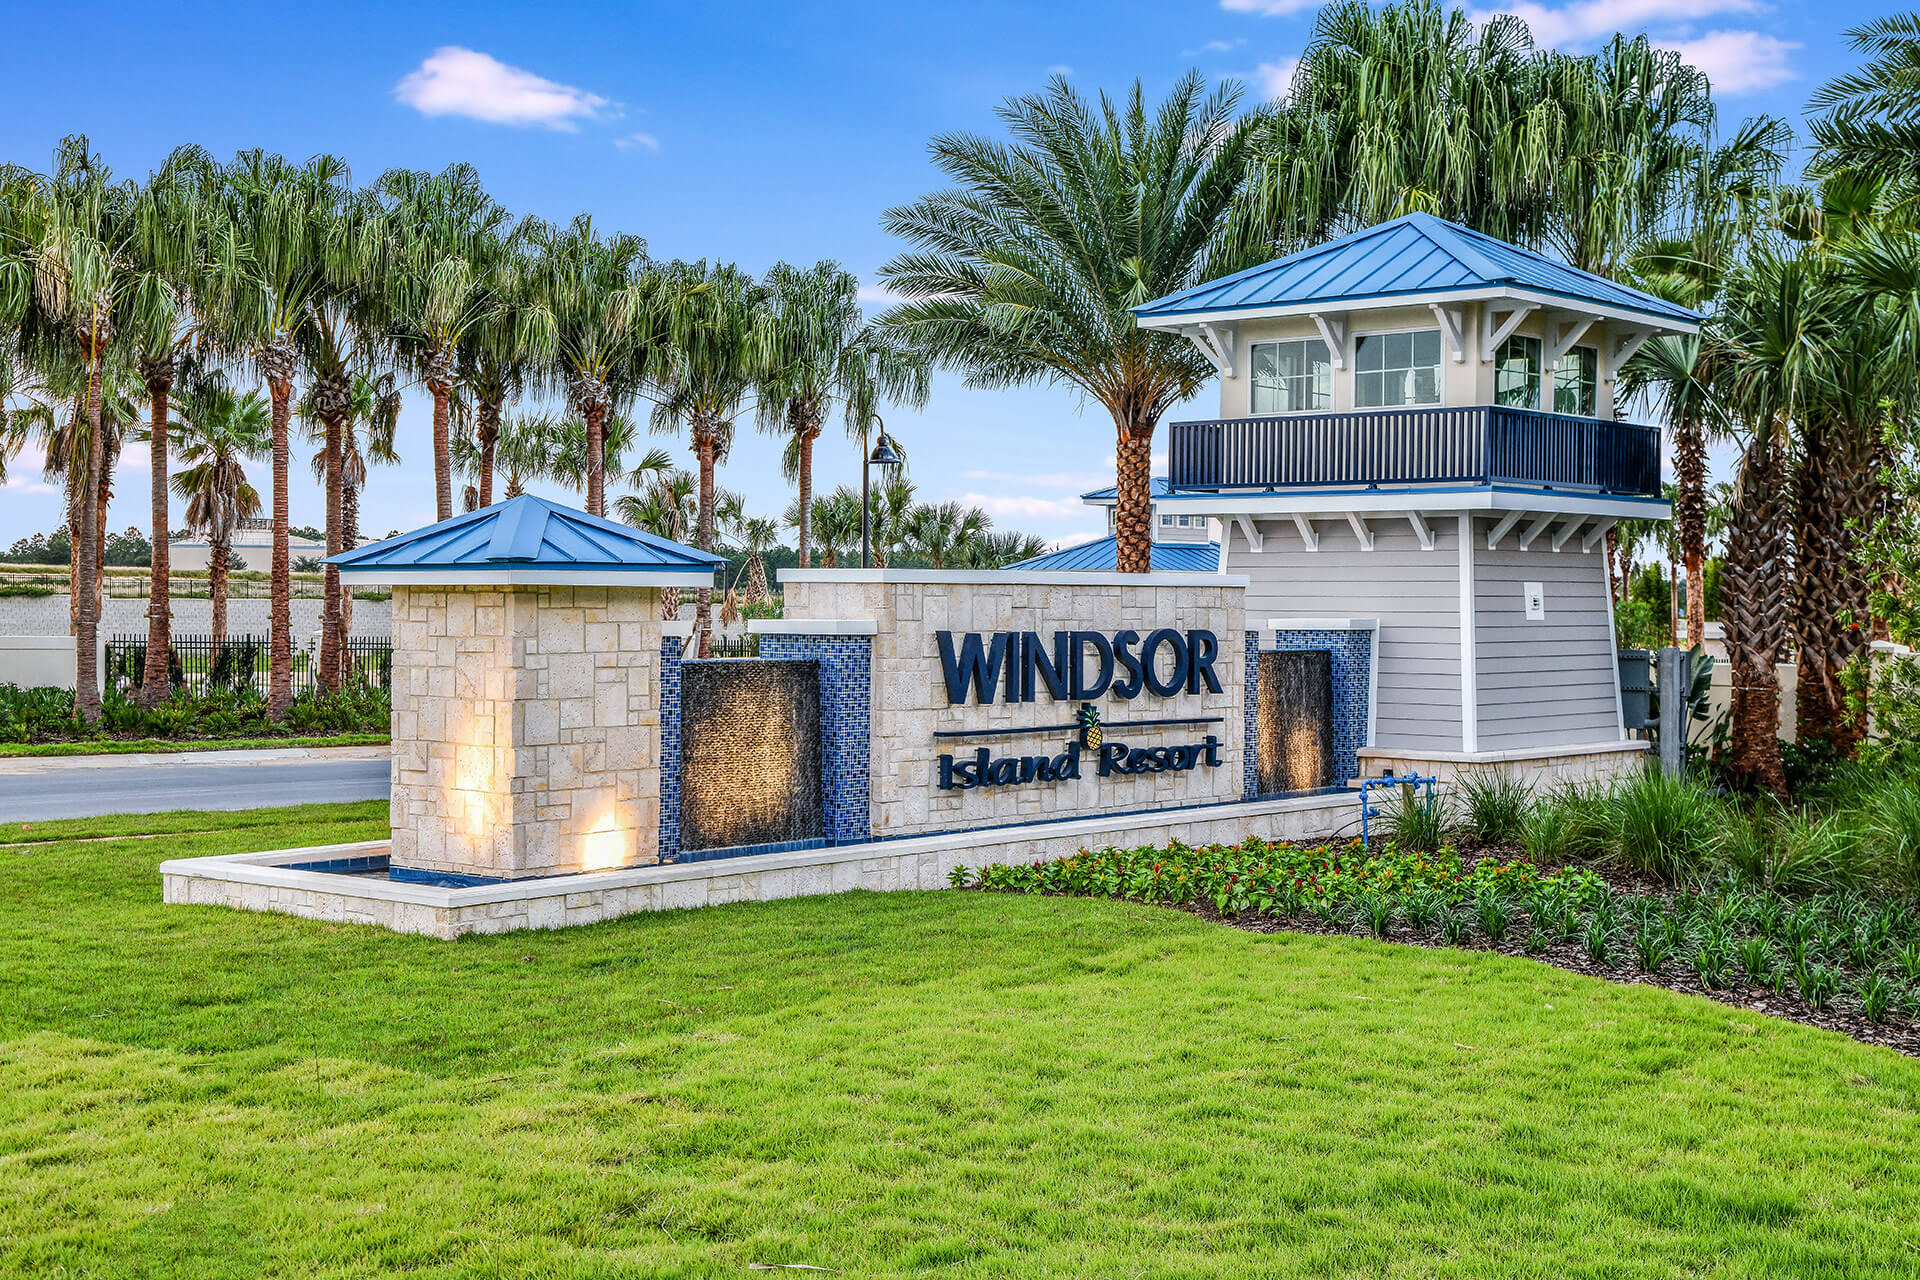 Windsor Island Sign